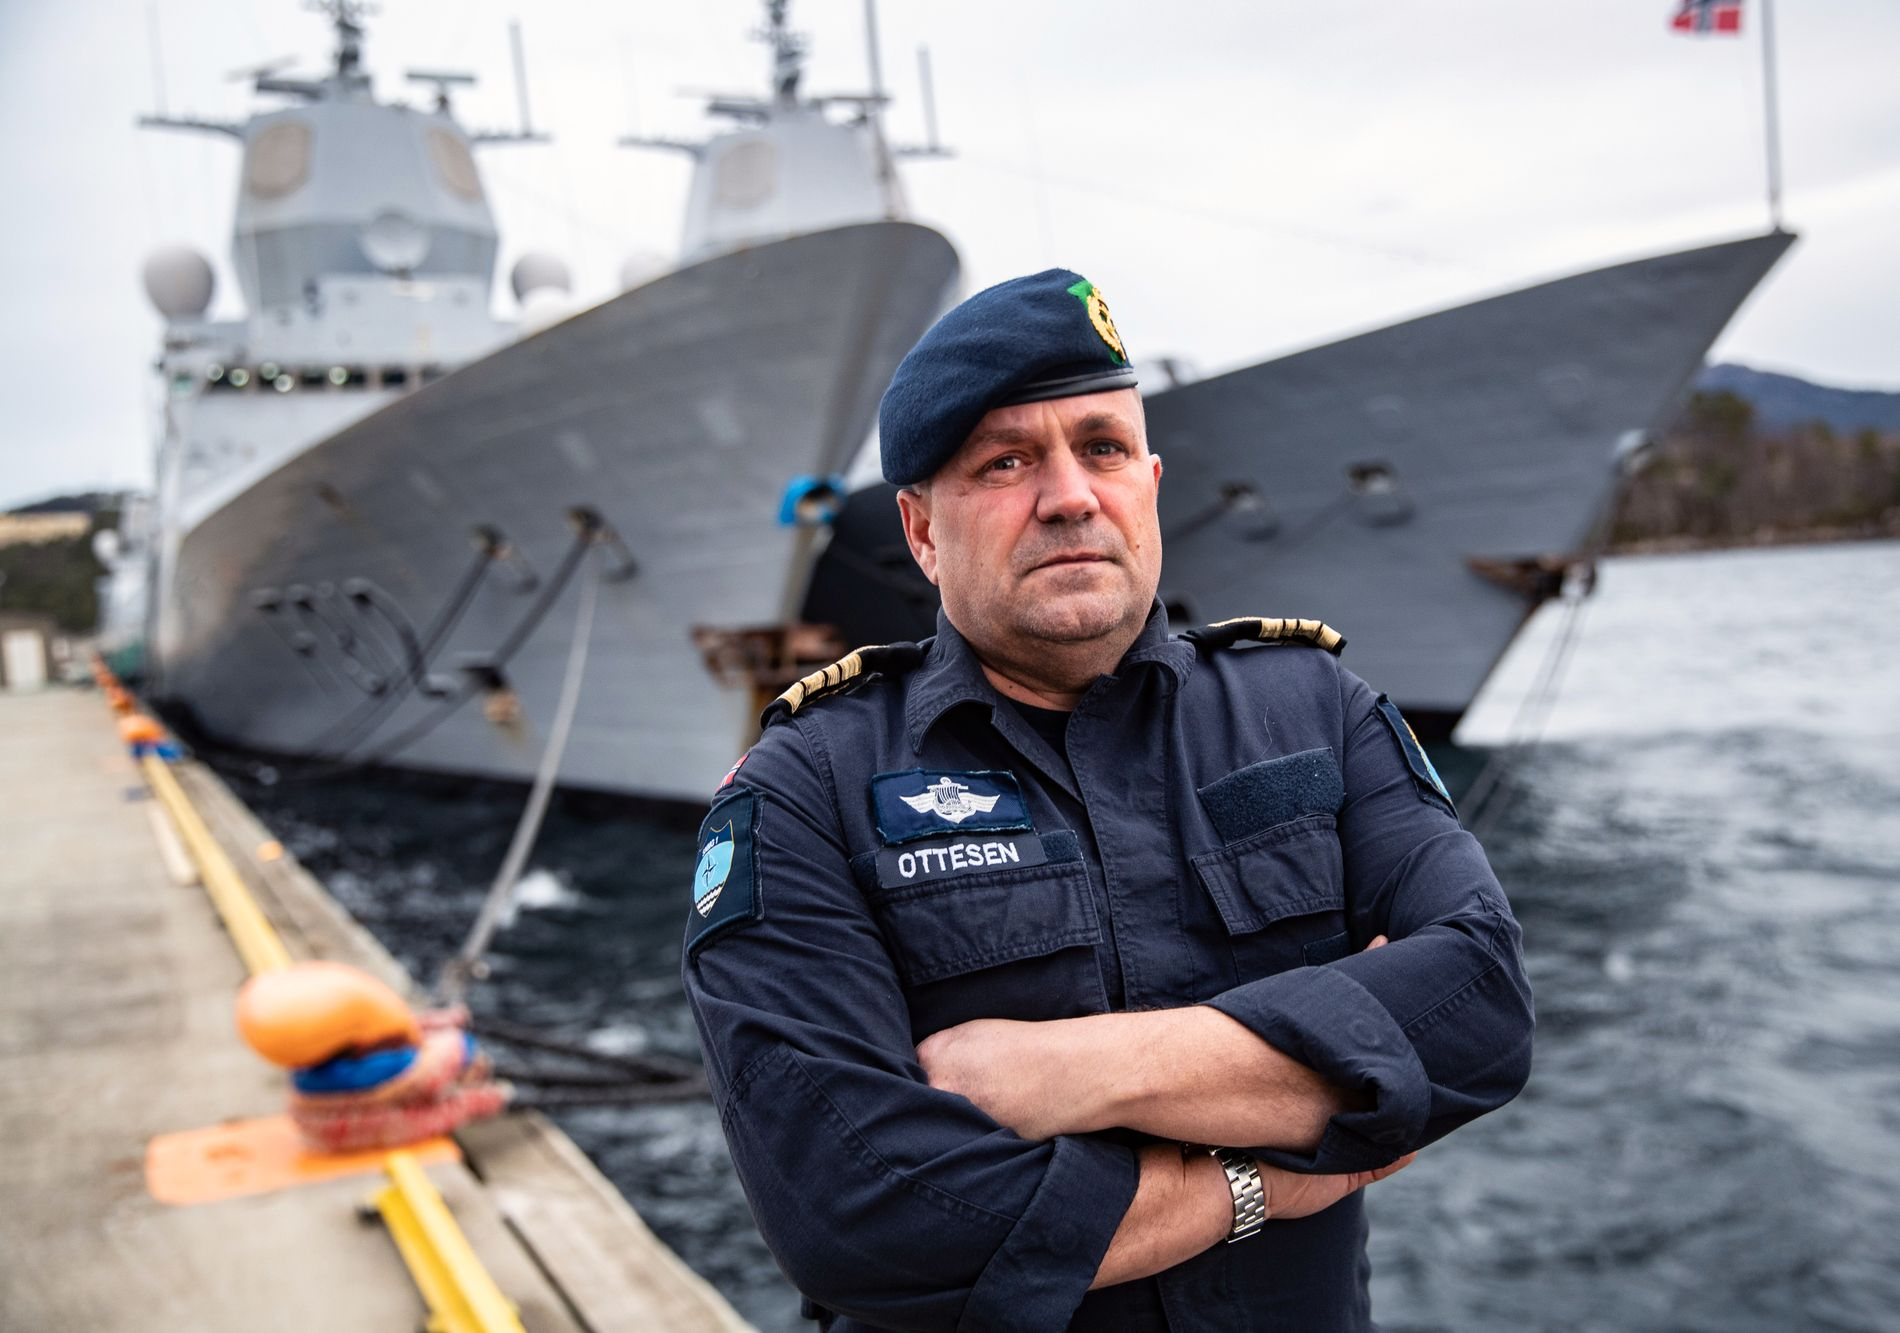 SKIPSSJEF: Kommandørkaptein Preben Ottesen foran fregattene KNM «Otto Sverdrup» og KNM «Thor Heyerdahl» på Haakonsvern.